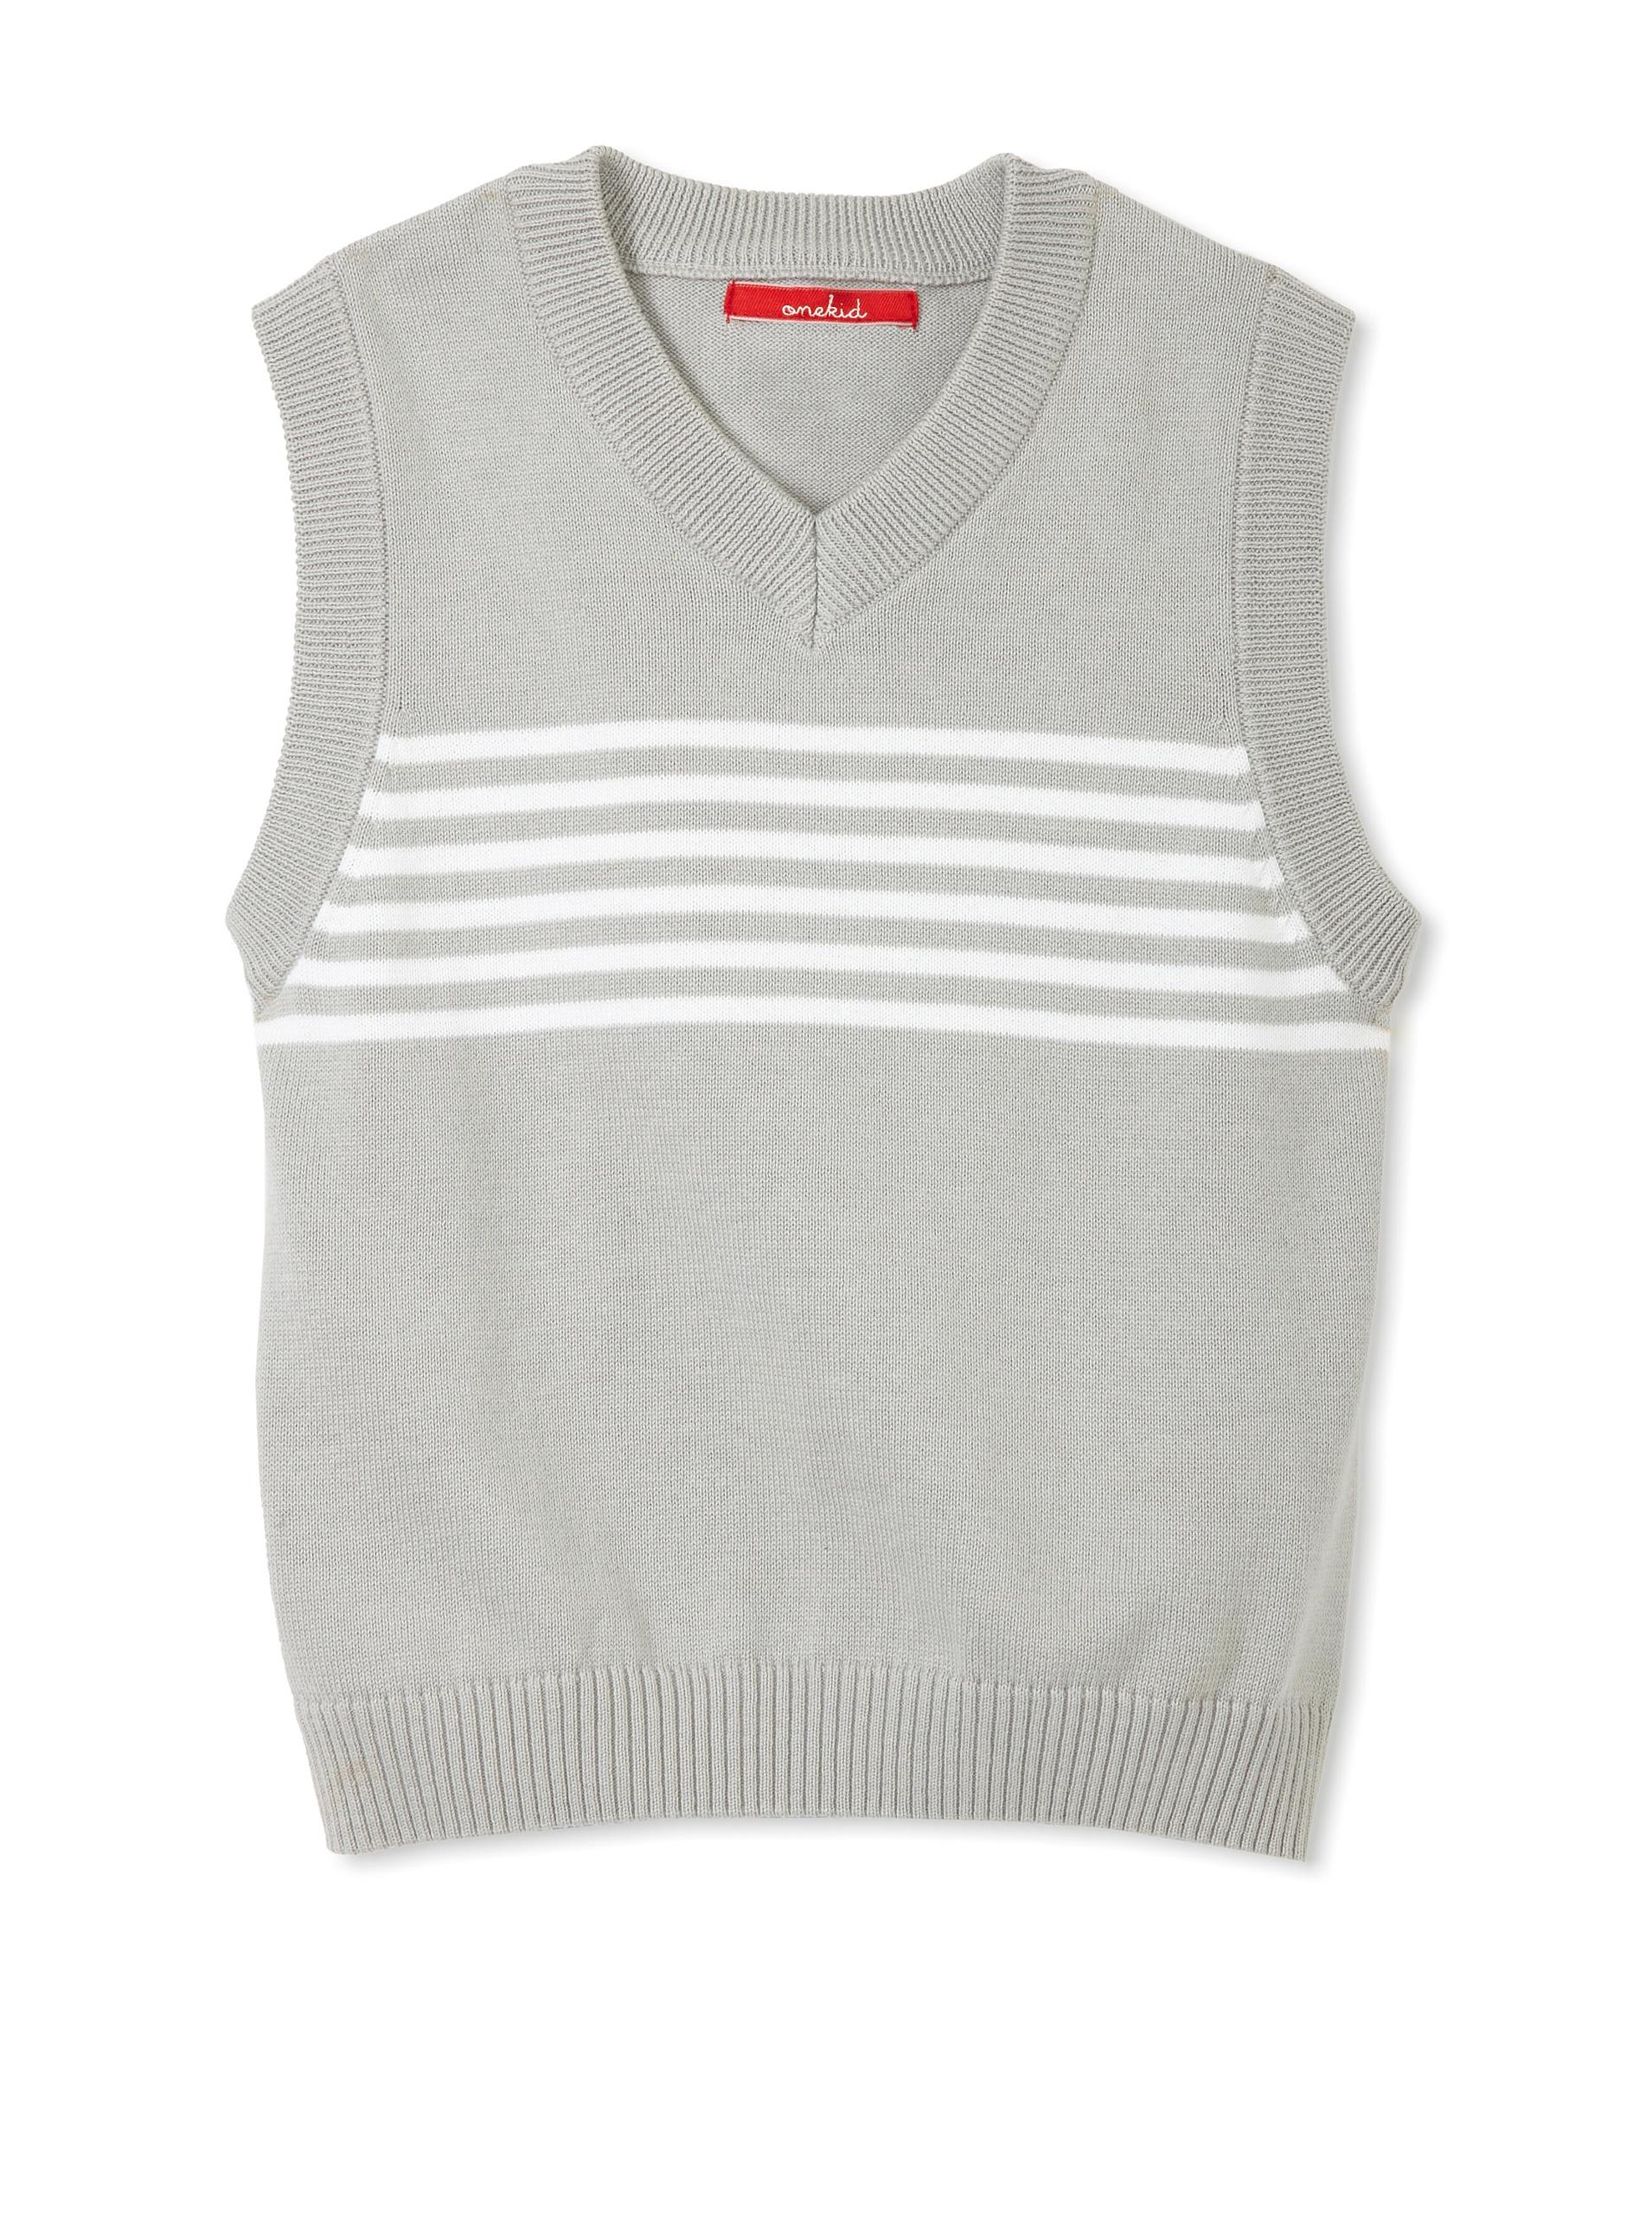 One Kid Boy's Striped Vest (Silver White)